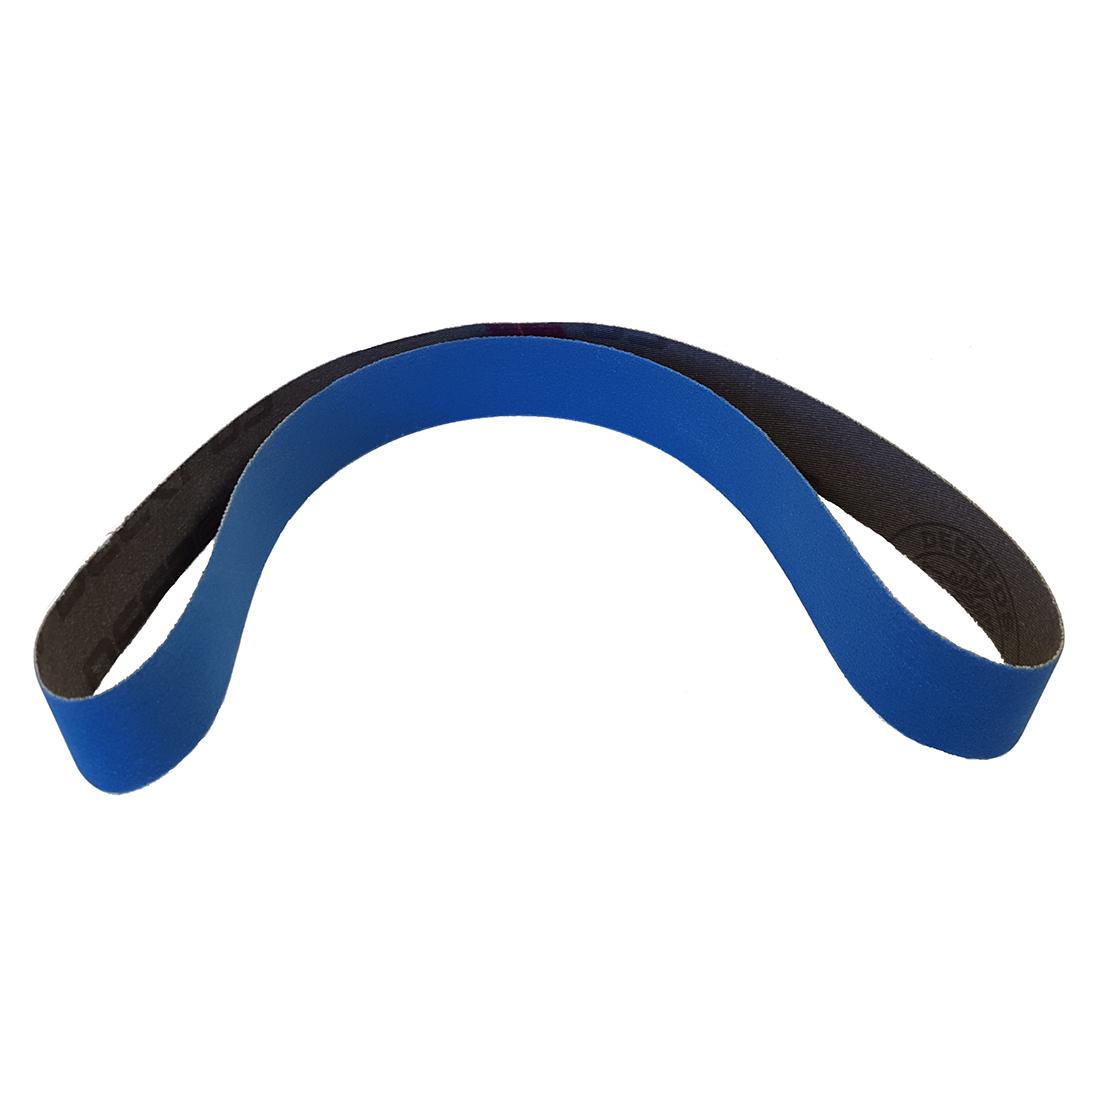 Ca J Plus Belt 1 X 30 10 Or 50 Pack Preferred Abrasives